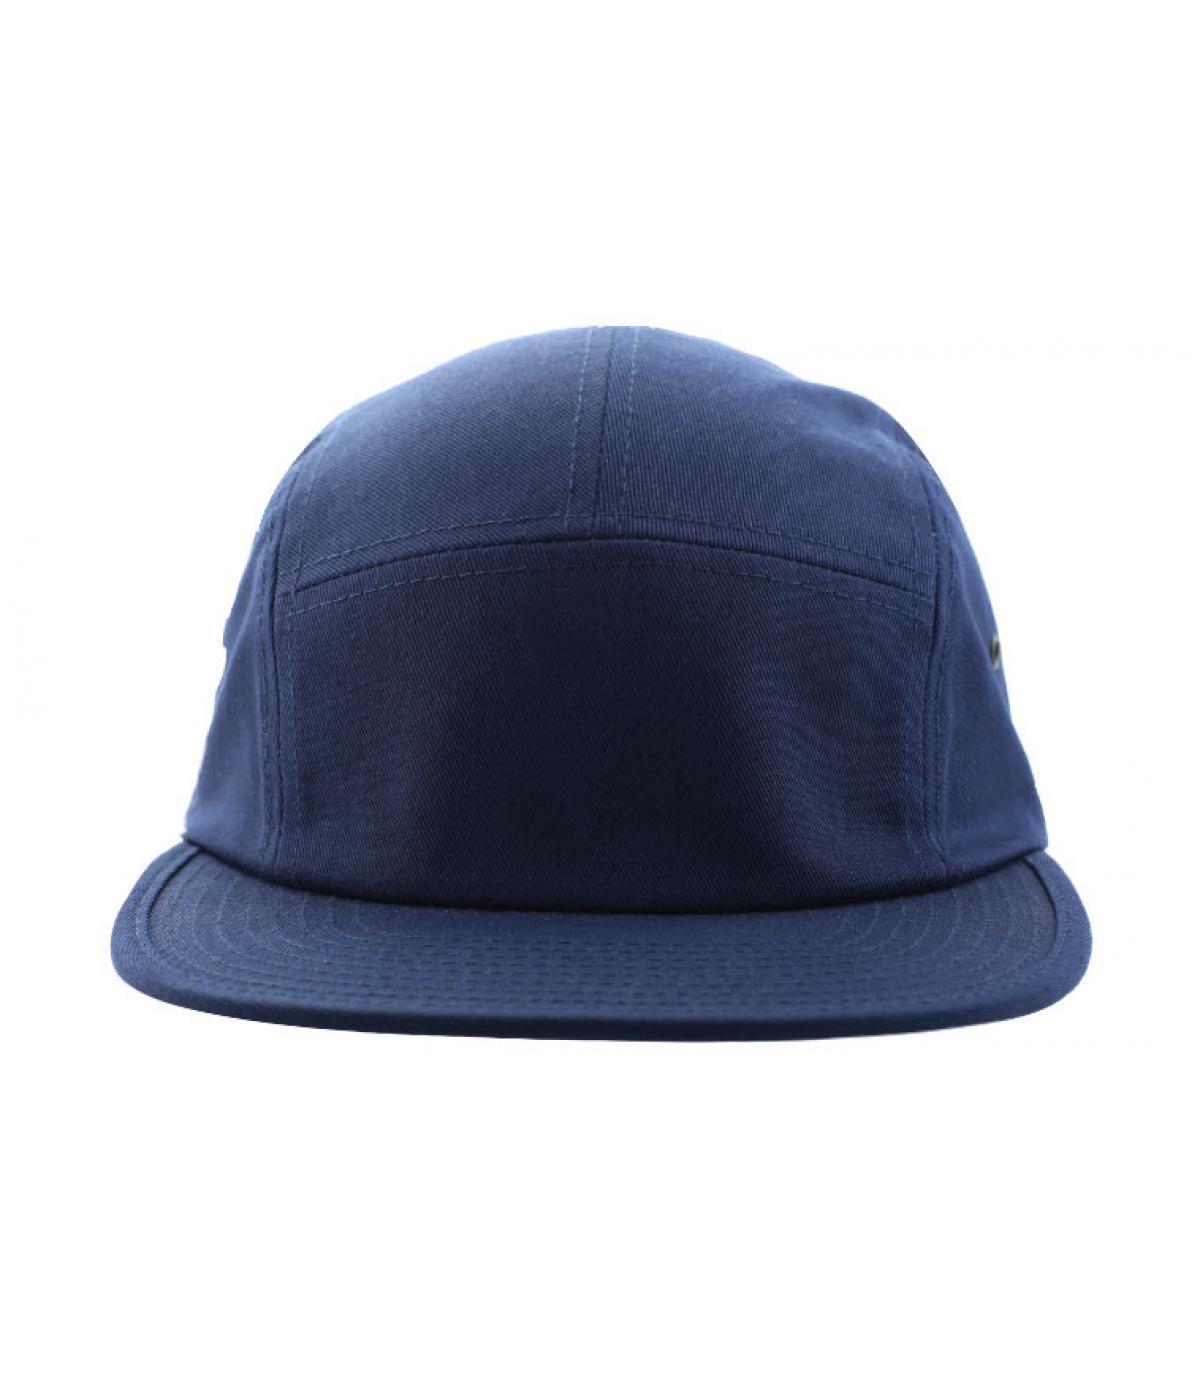 Navy 5 panel cap